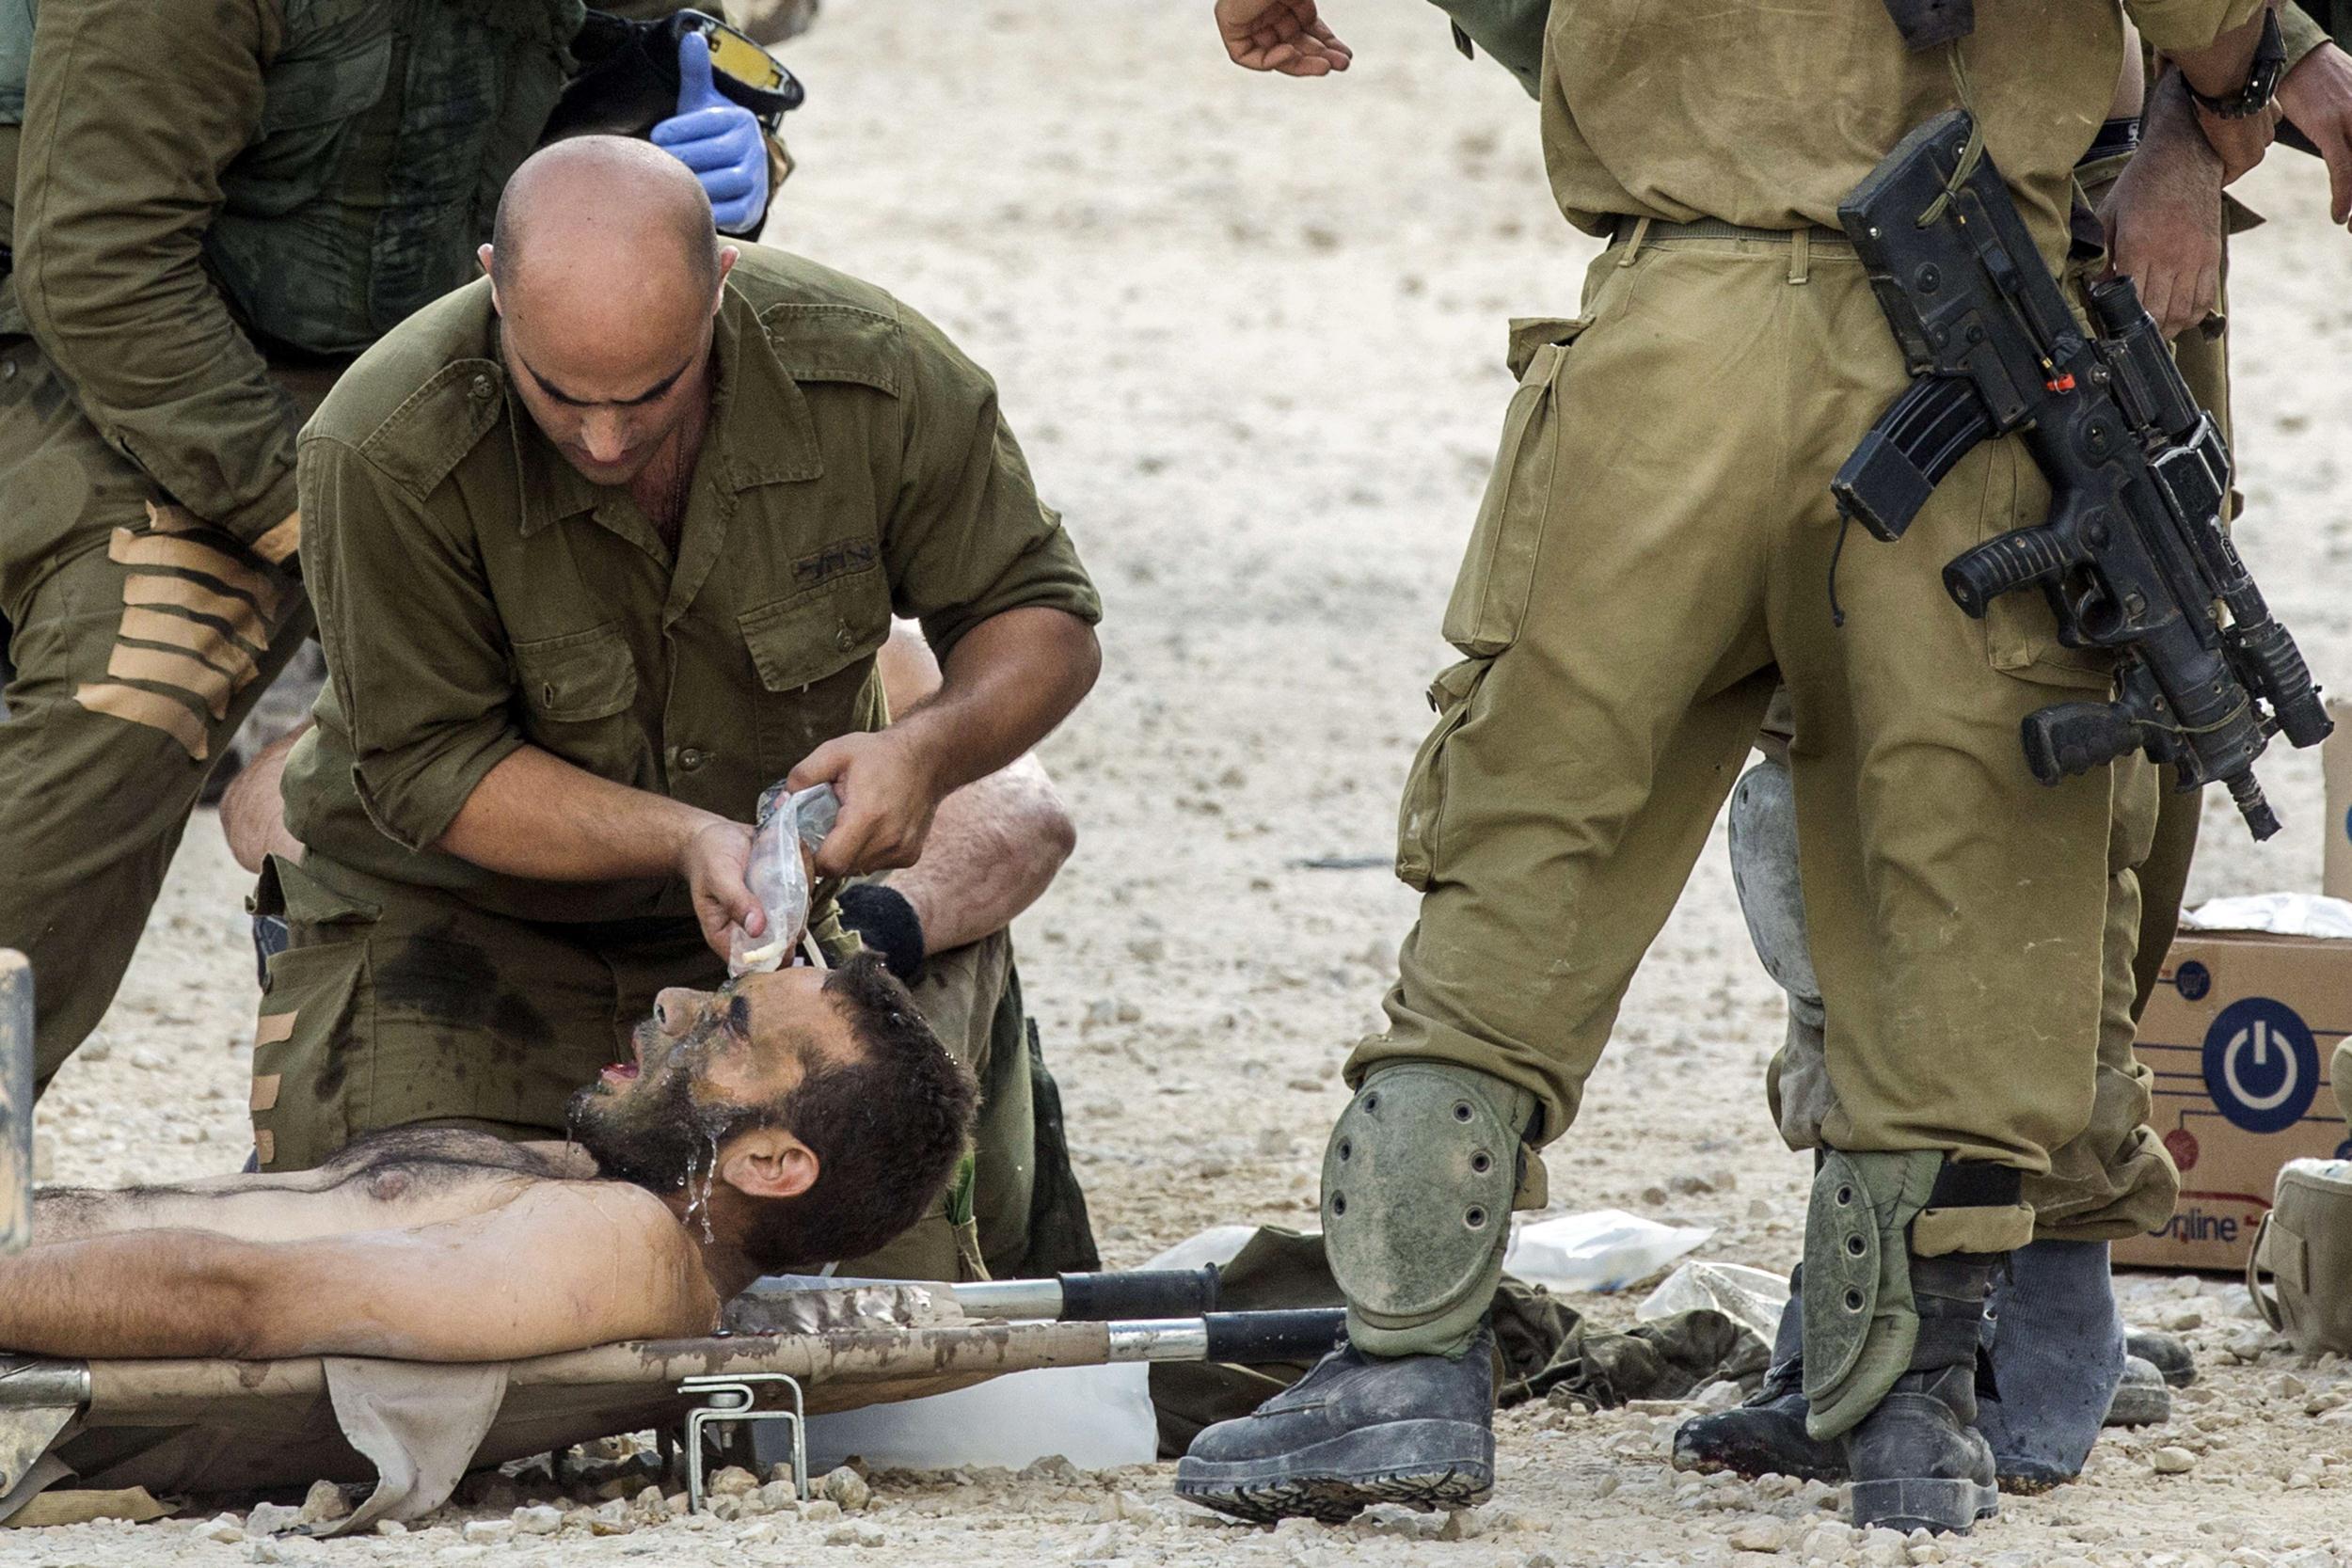 140720-israel-soldier-injured-1020a_f7c68d9f367284a7b5909bc7ee595a91.jpg